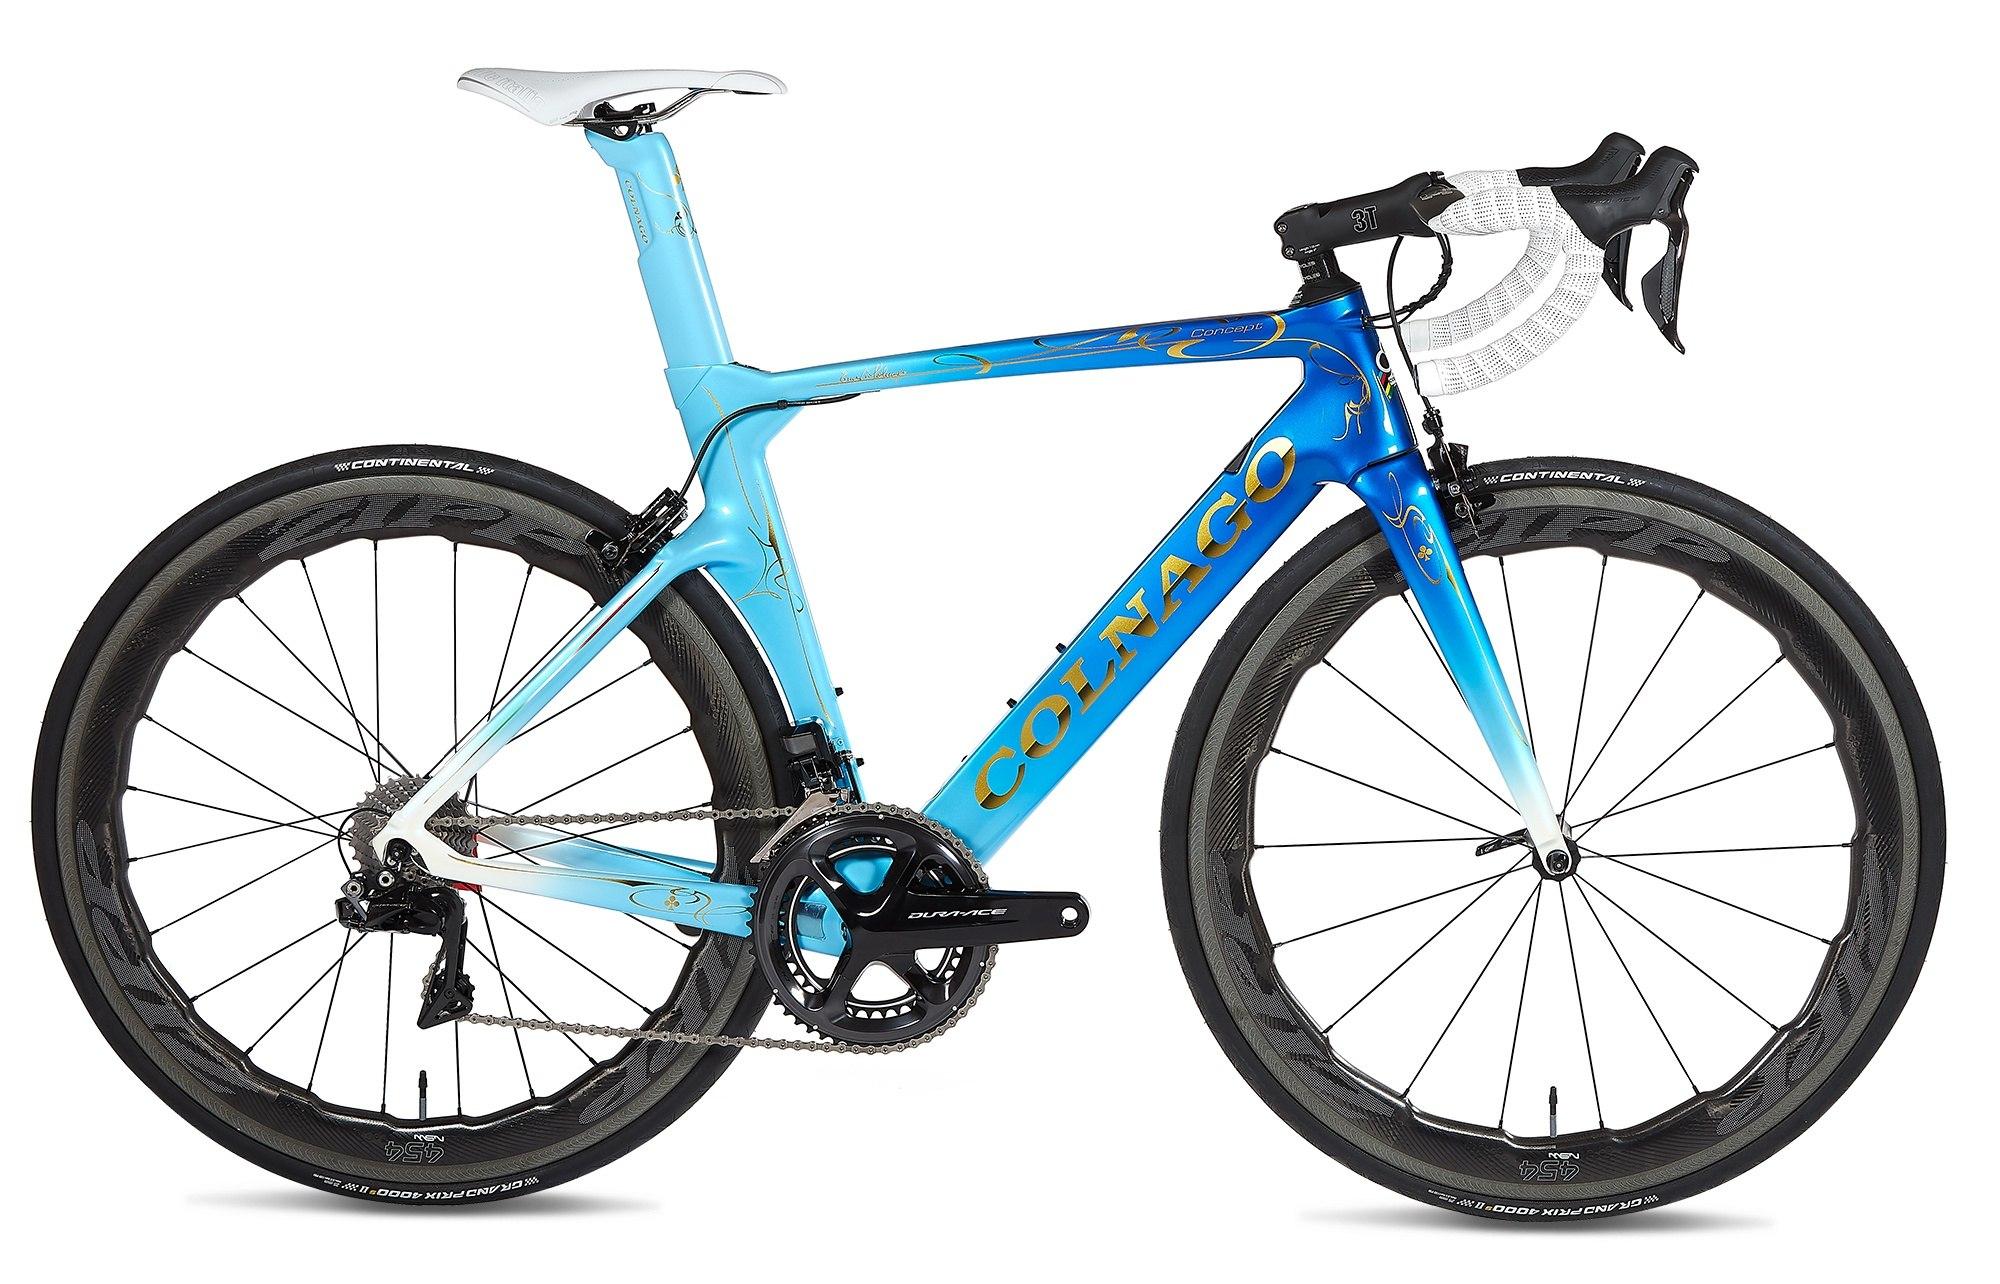 Colnago Concept Art Decor Dura Ace Di2 Bike R Amp A Cycles